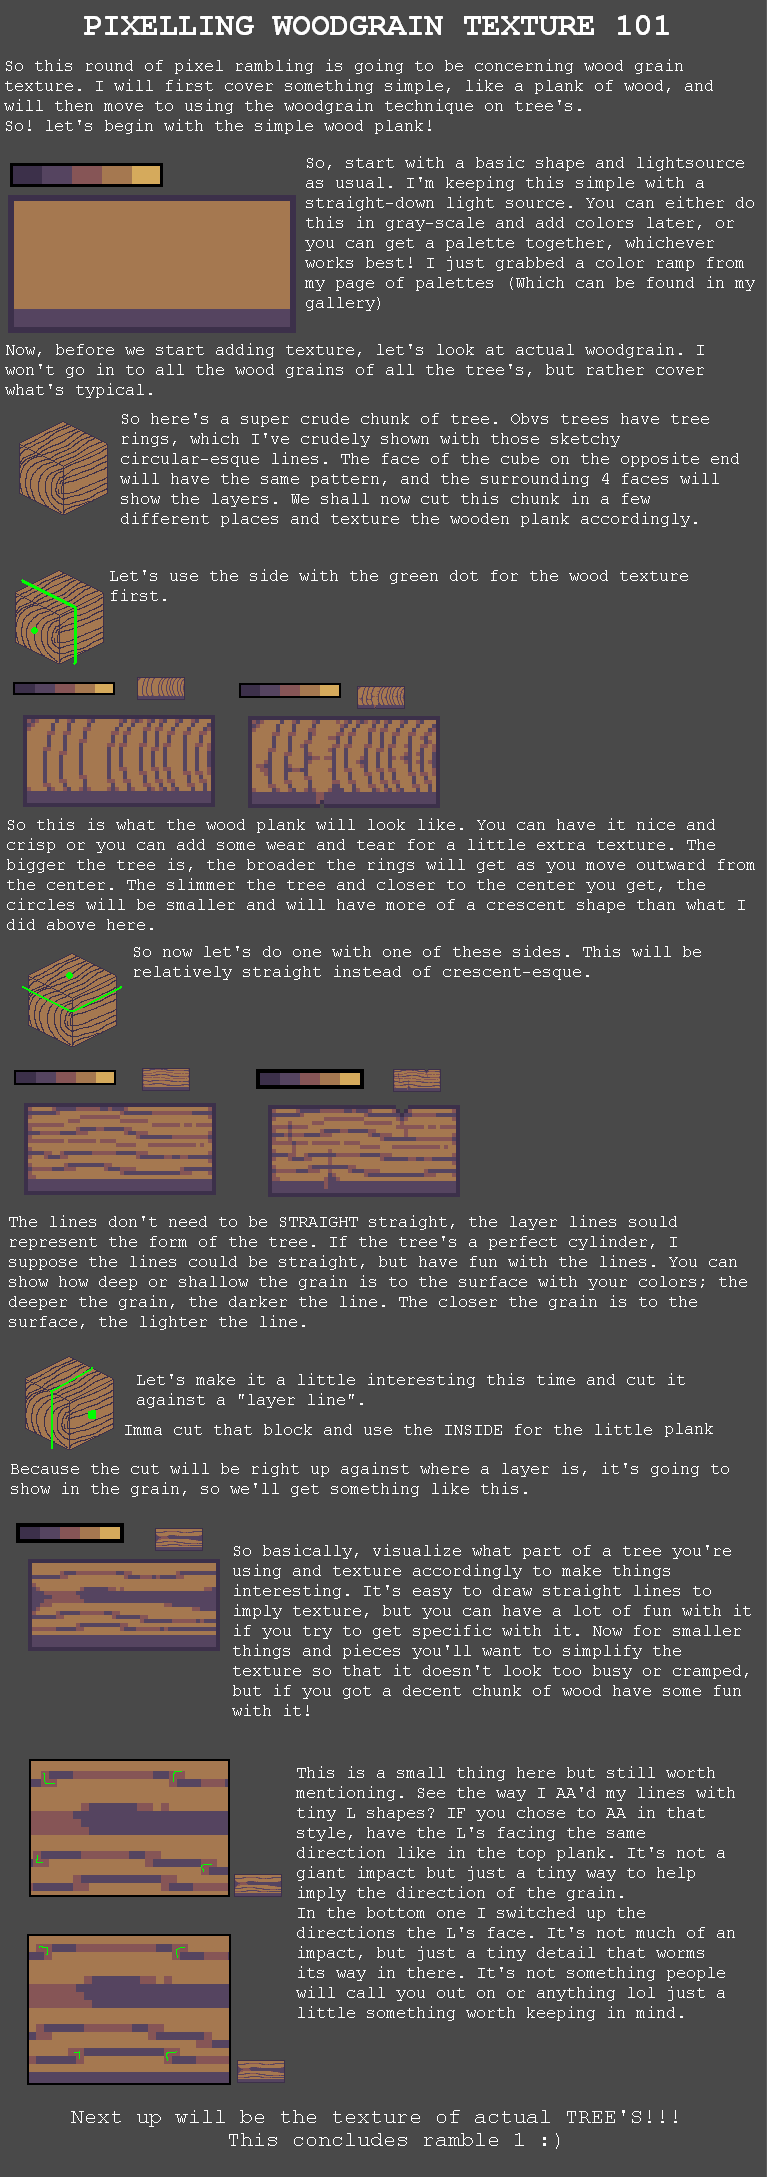 Wood grain texture Pt. 1